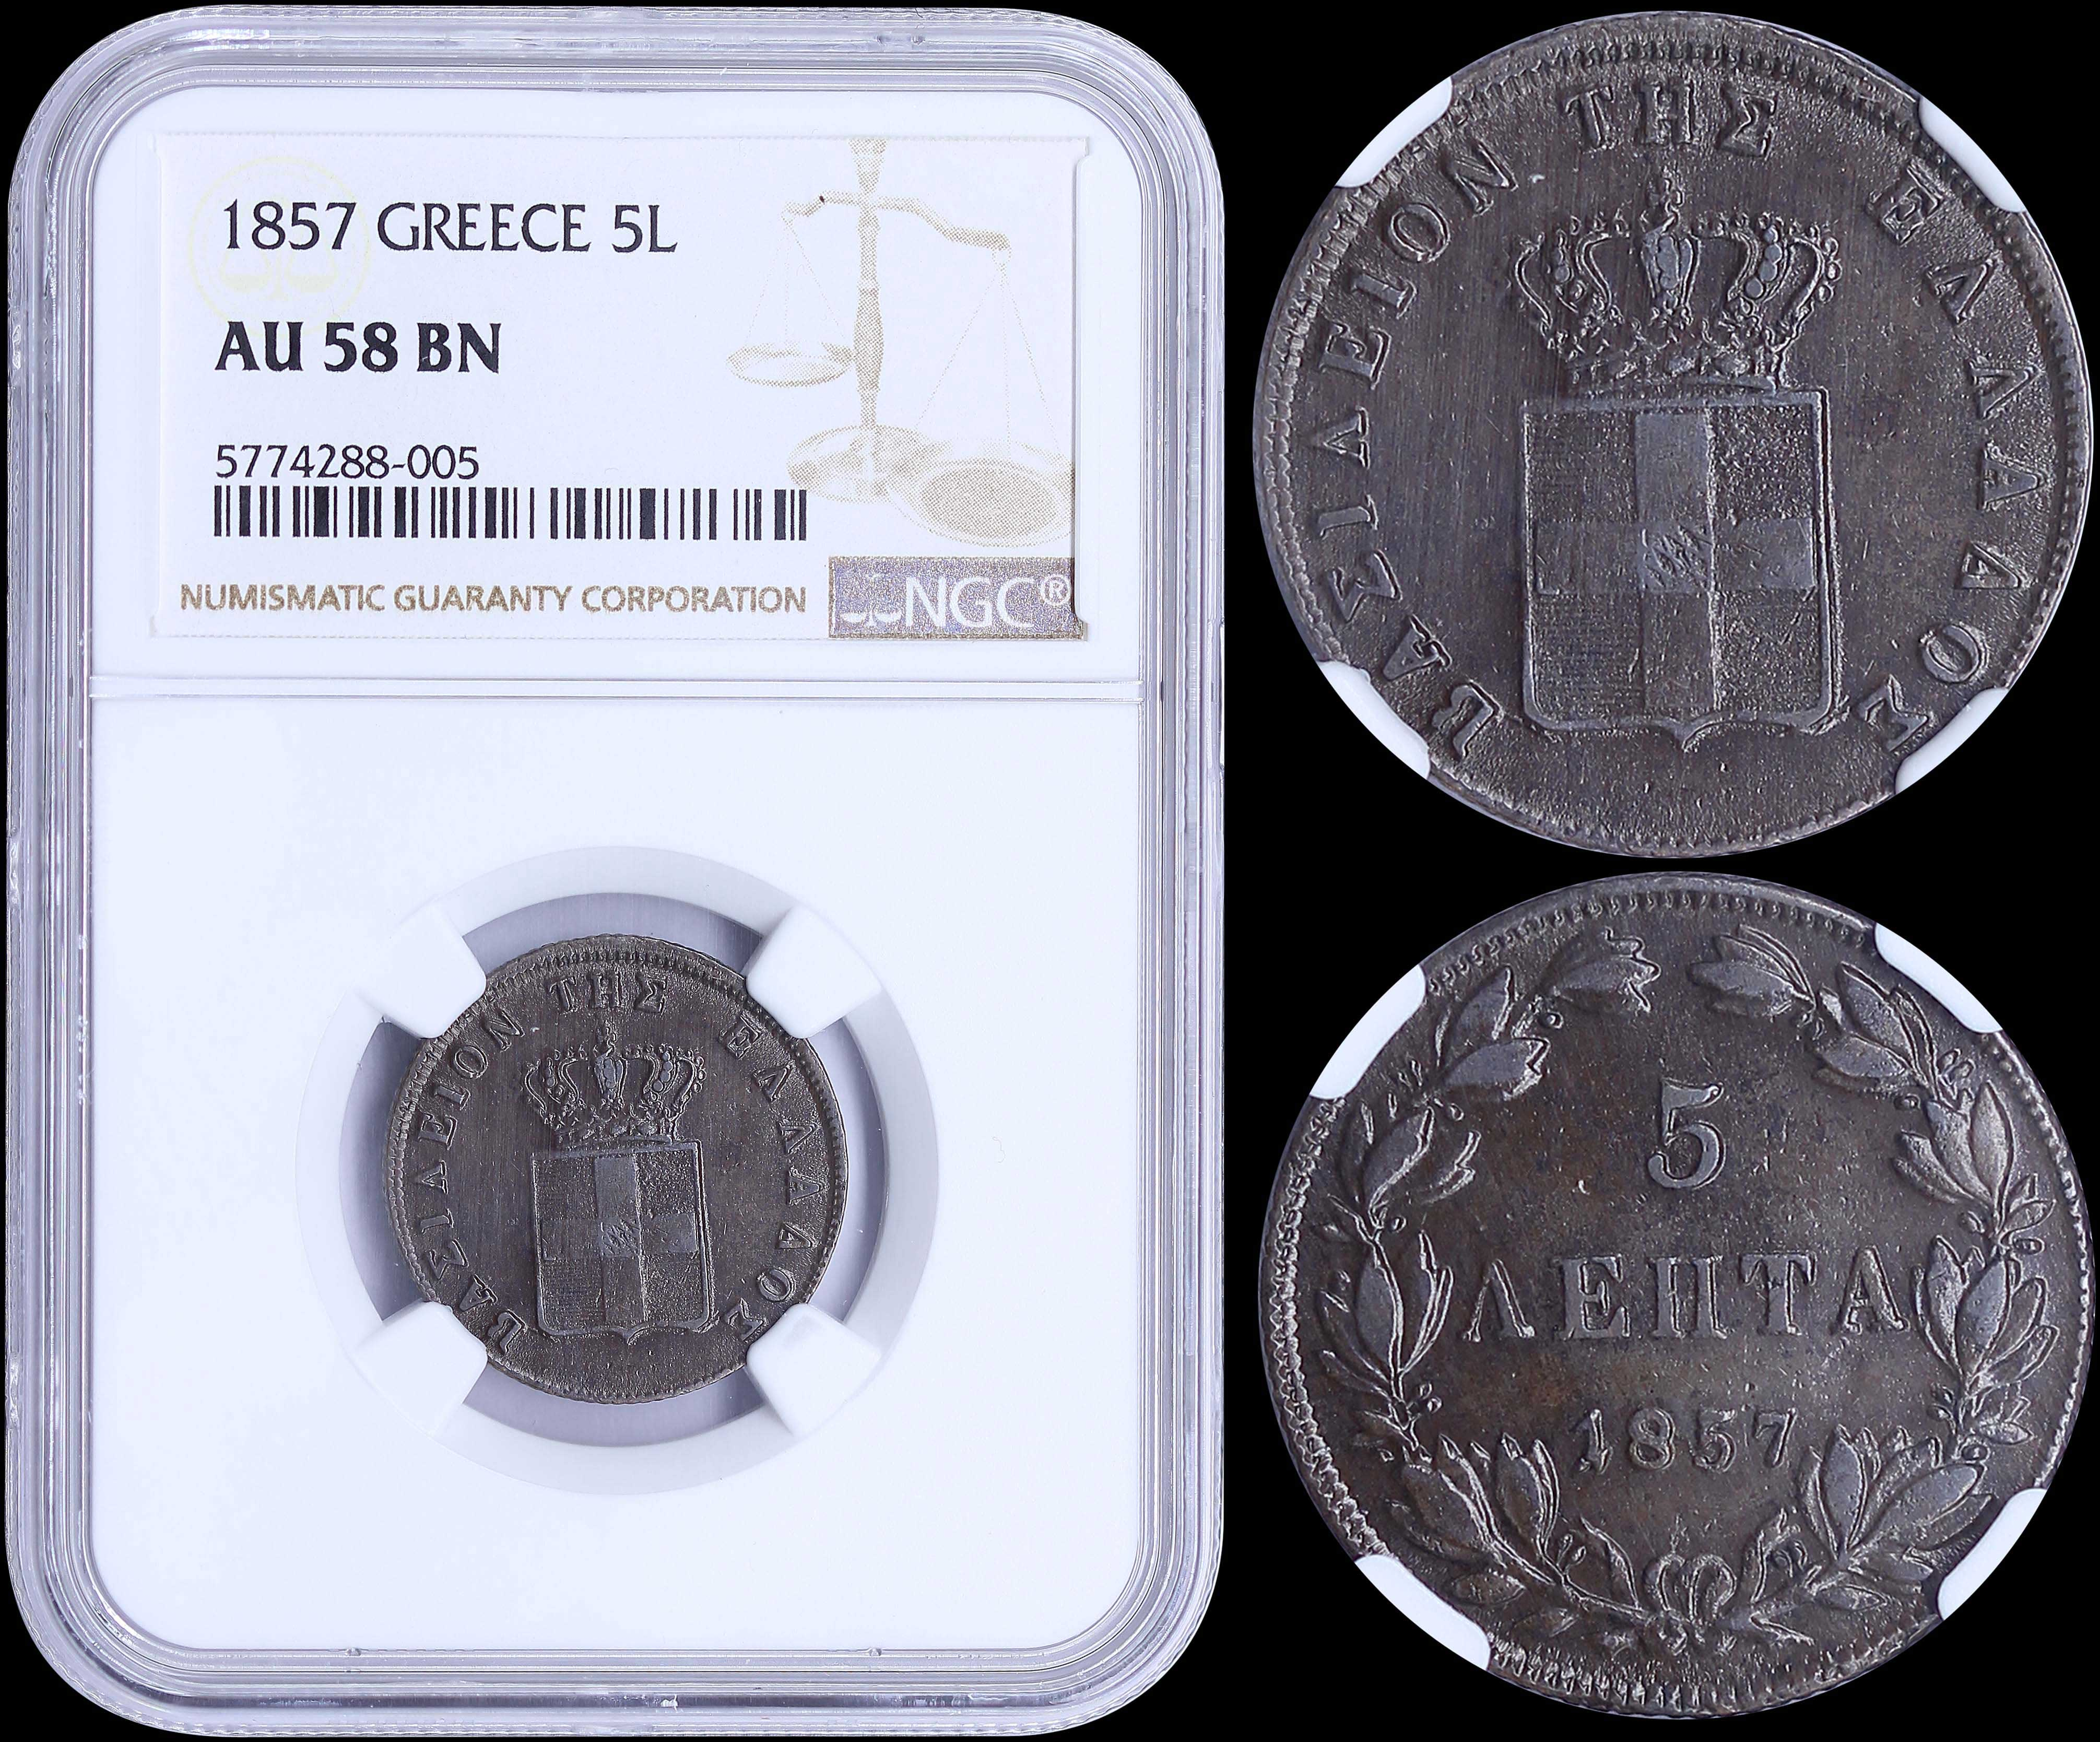 Lot 6022 - -  COINS & TOKENS king otto -  A. Karamitsos Live Bid Auction Coins, Medals & Banknotes